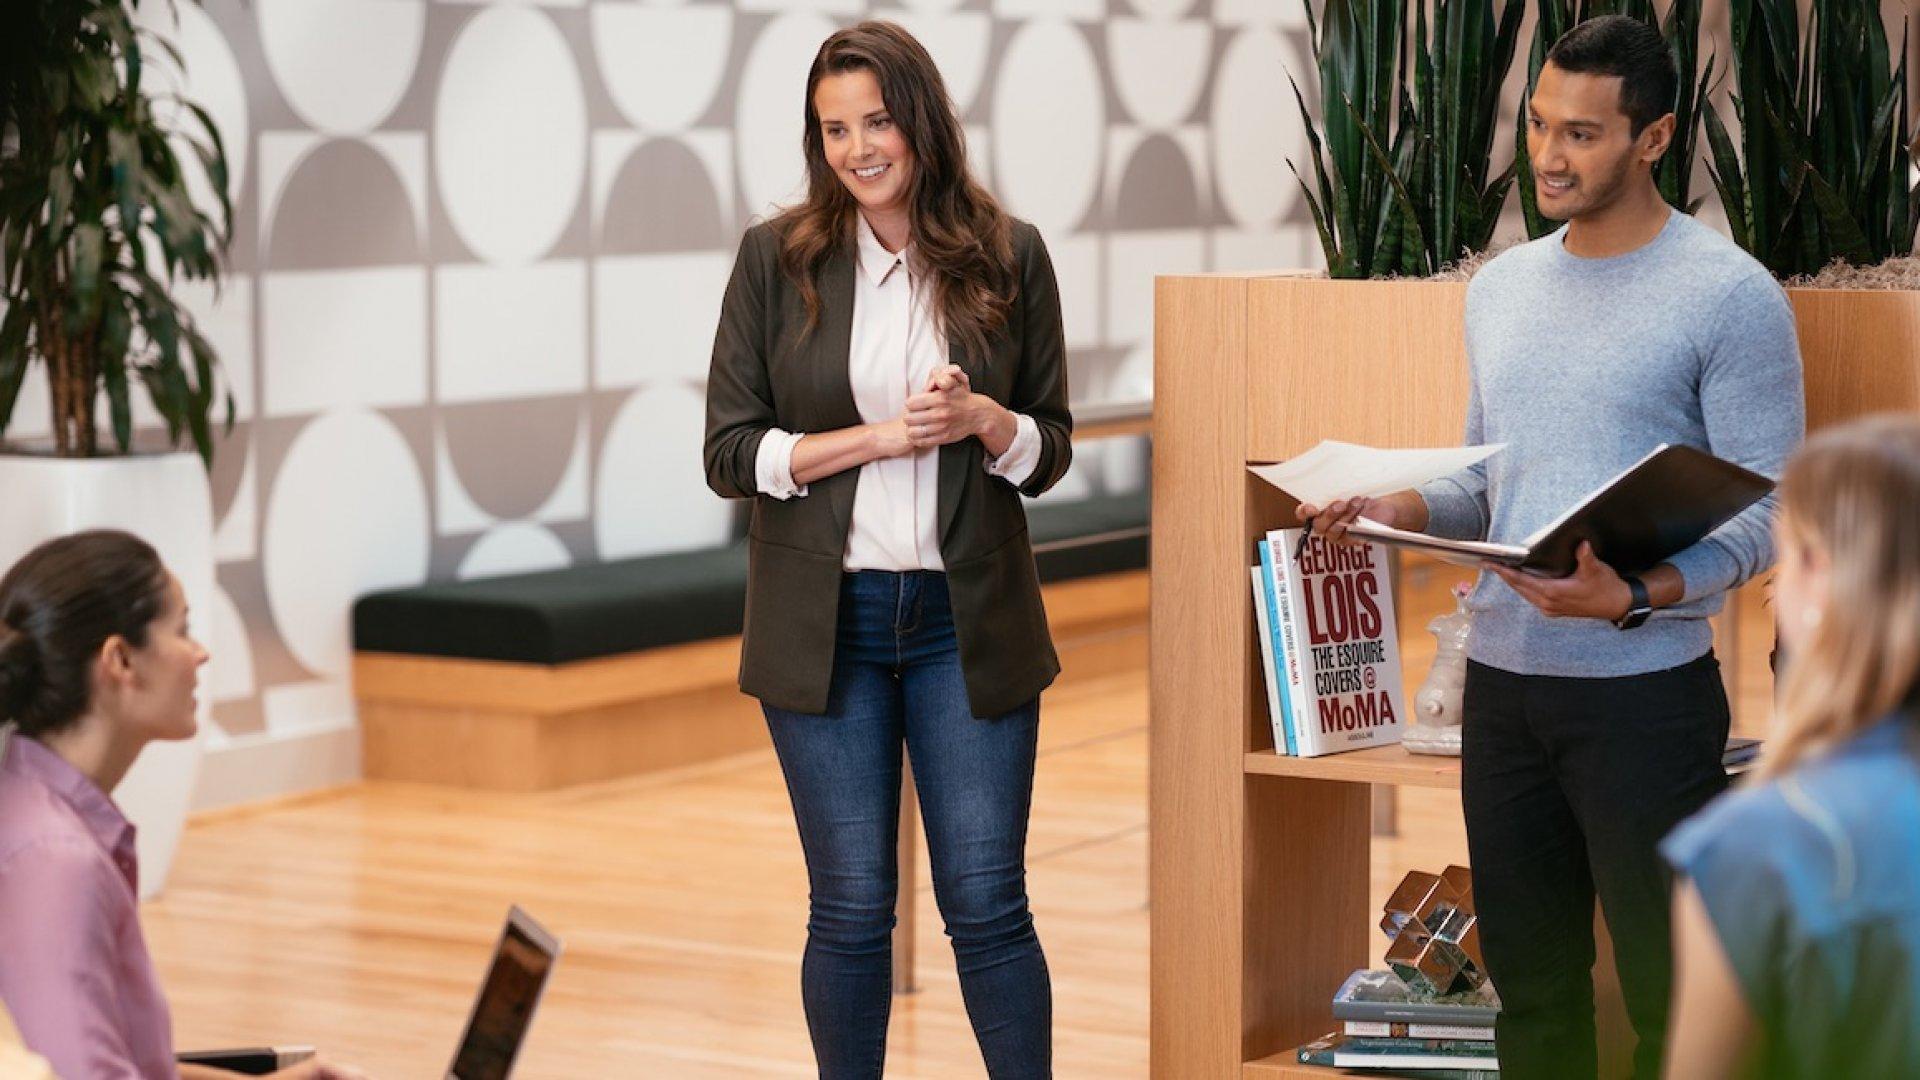 Women in Business: Six Secrets for Success